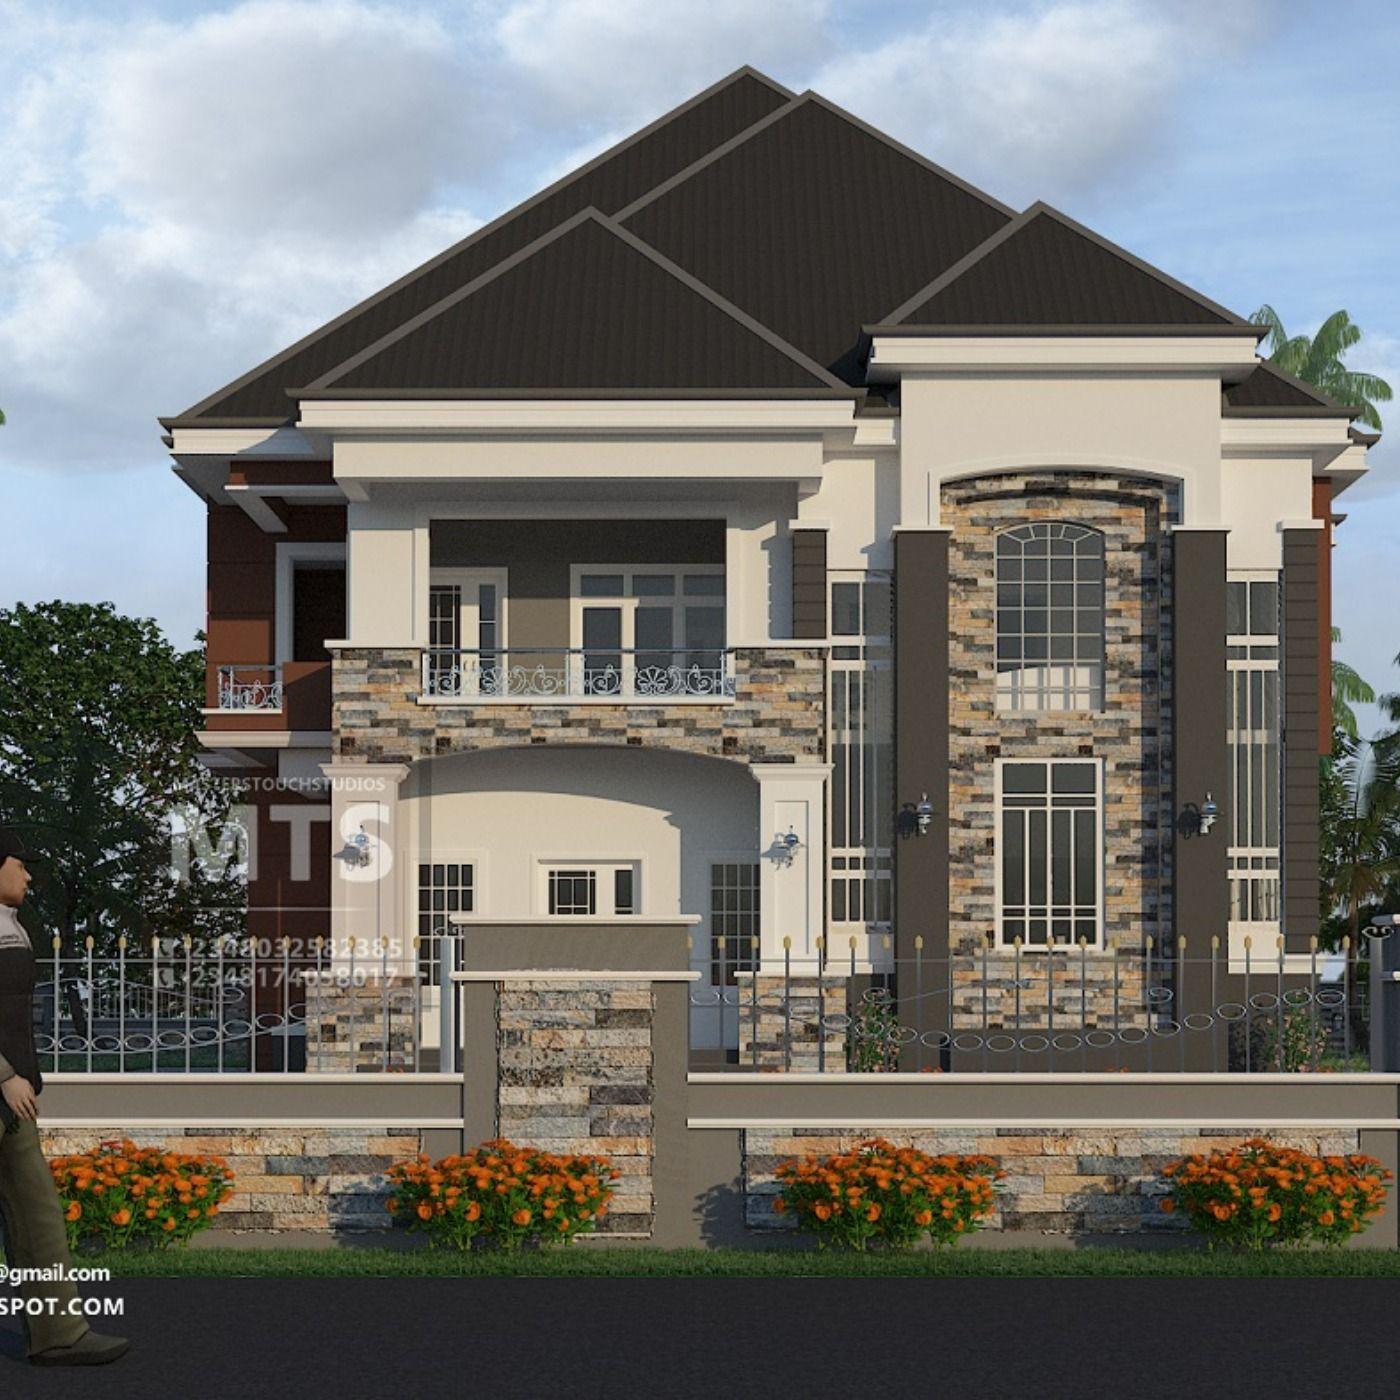 999bf21a48f3991aac6d667ac5584f88 - Download Dream House Modern Duplex House Designs In Nigeria Background